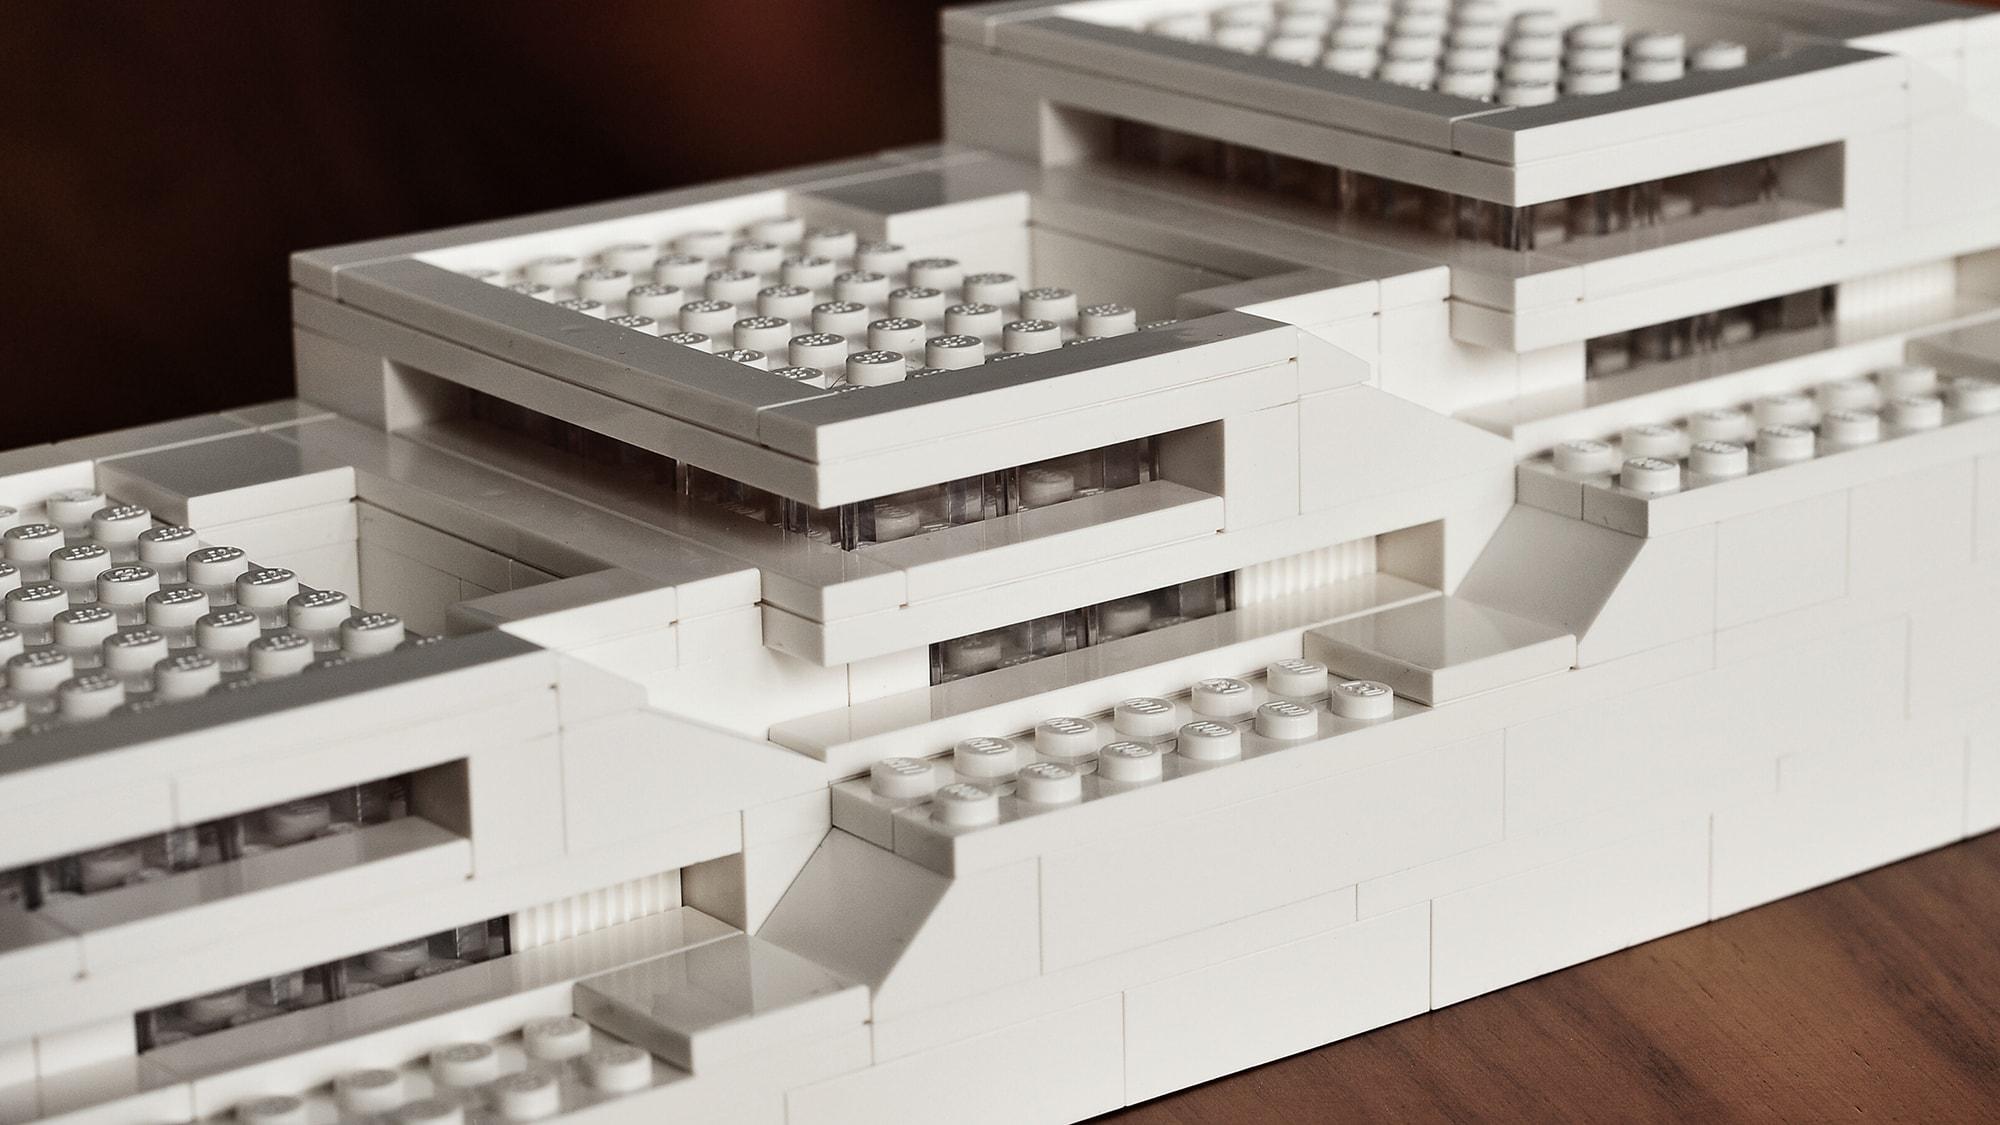 Lego Maket